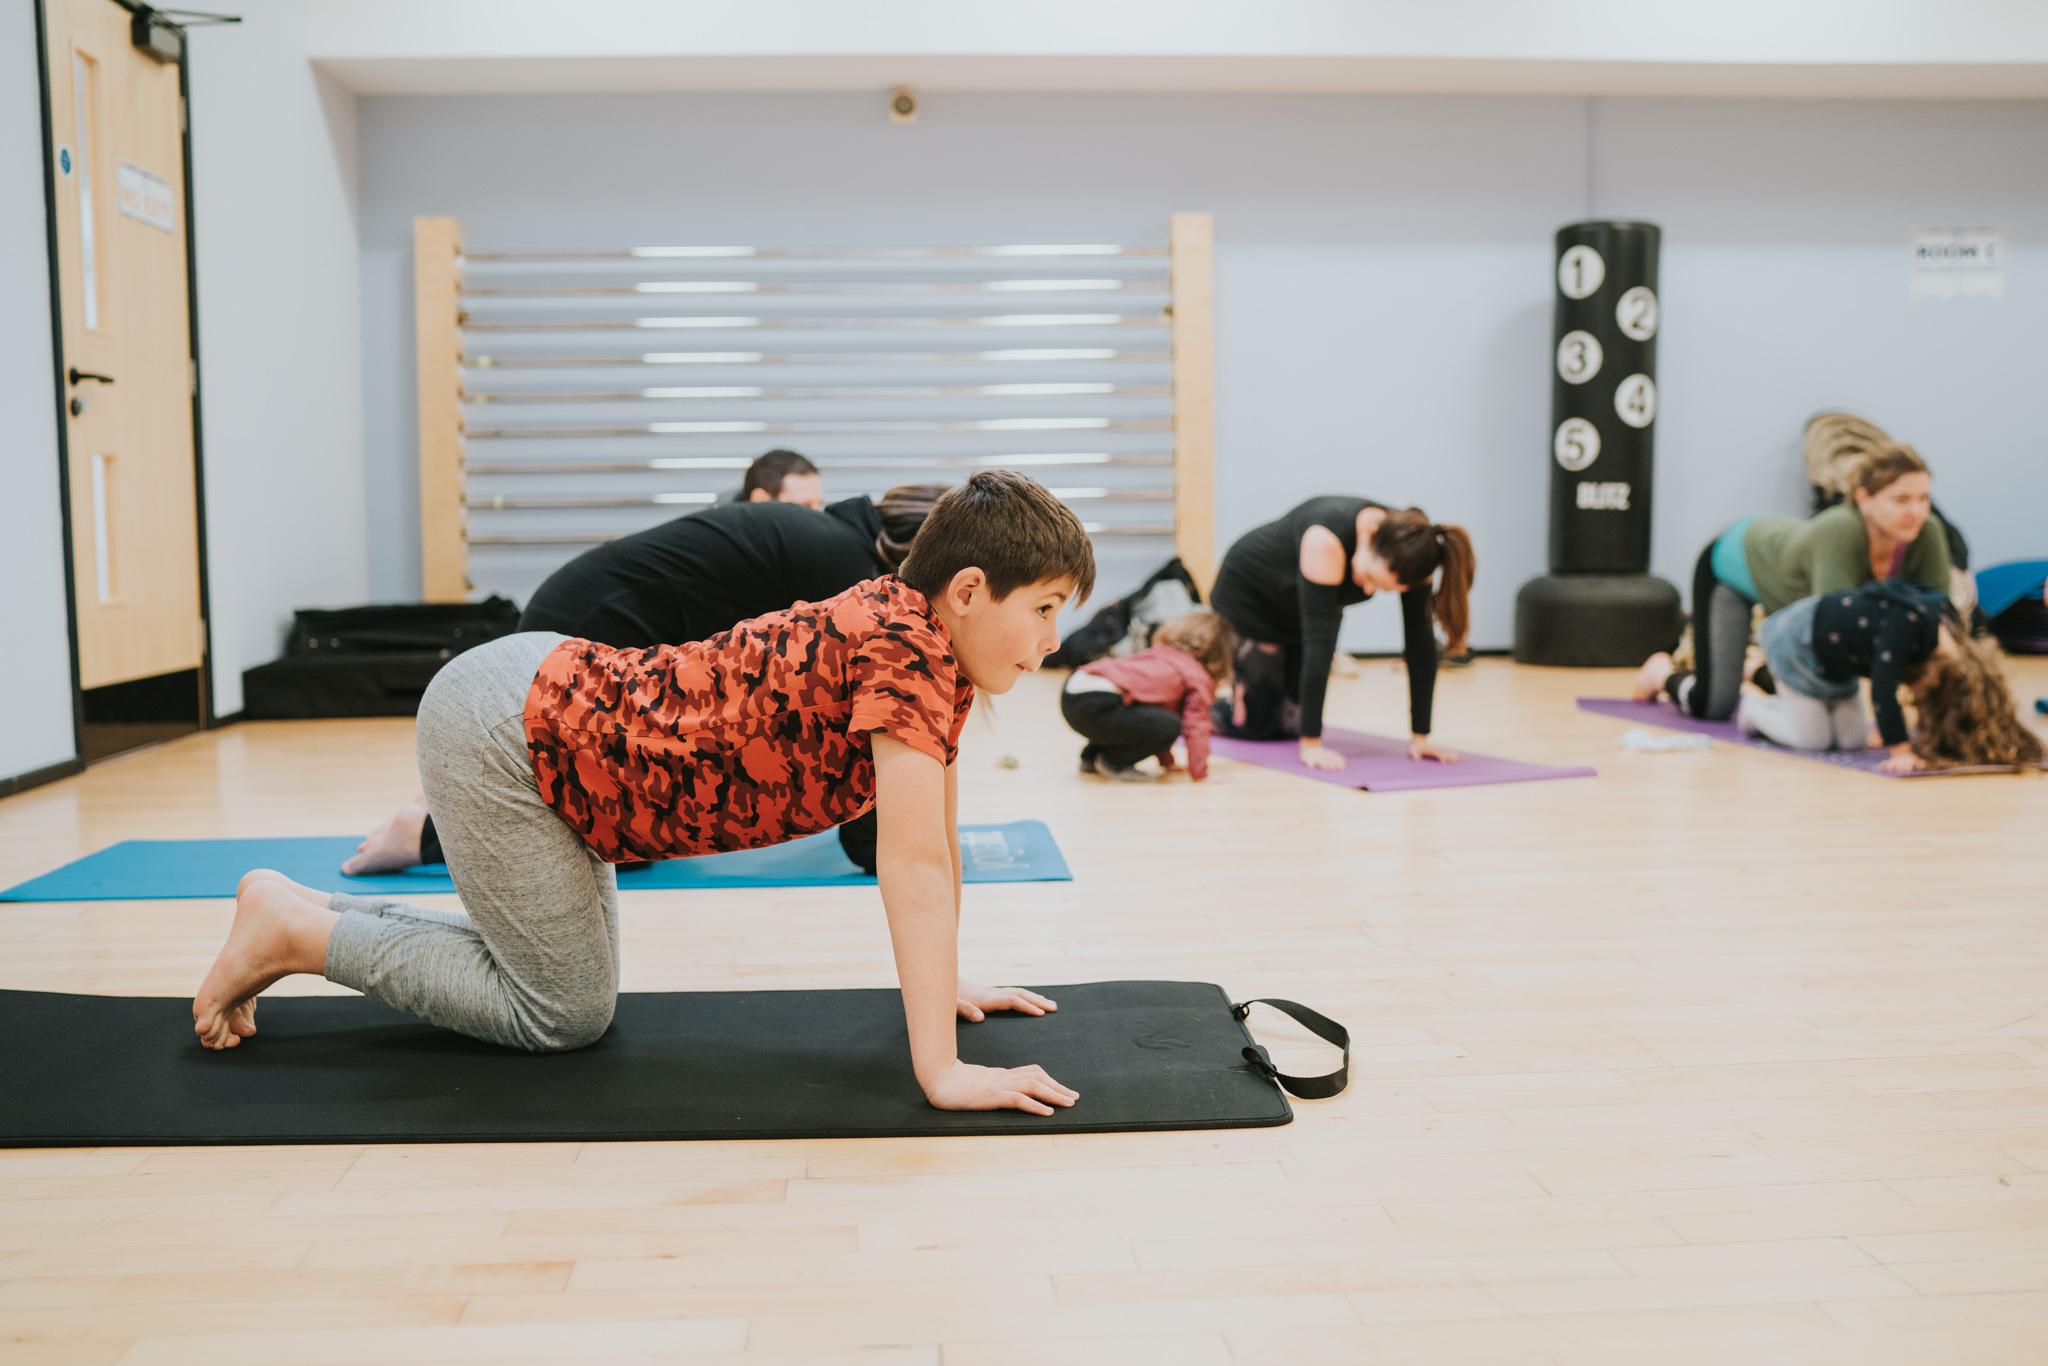 yogific-essex-yoga-vegan-festival-essex-university-grace-elizabeth-colchester-essex-alternative-wedding-lifestyle-photographer-suffolk-norfolk-devon-london-vegan-nights-cruelty-free (13 of 73).jpg